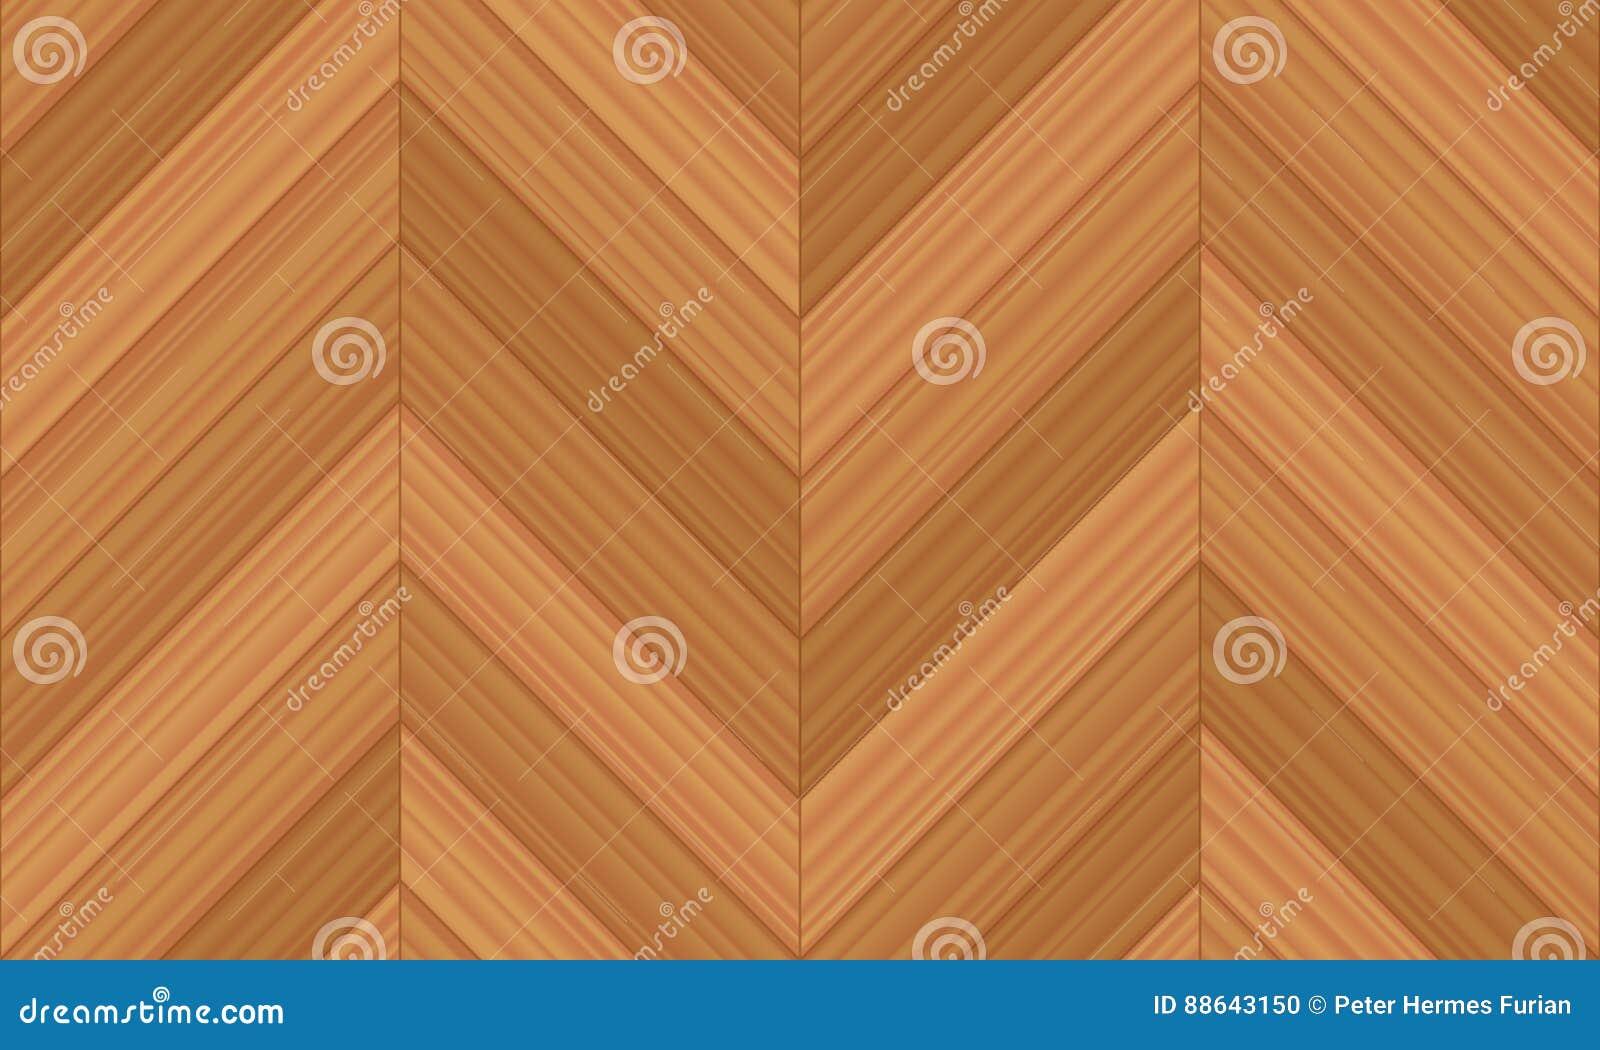 Fußboden Planken ~ Chevron parkett bretterboden nahtloses muster vektor abbildung